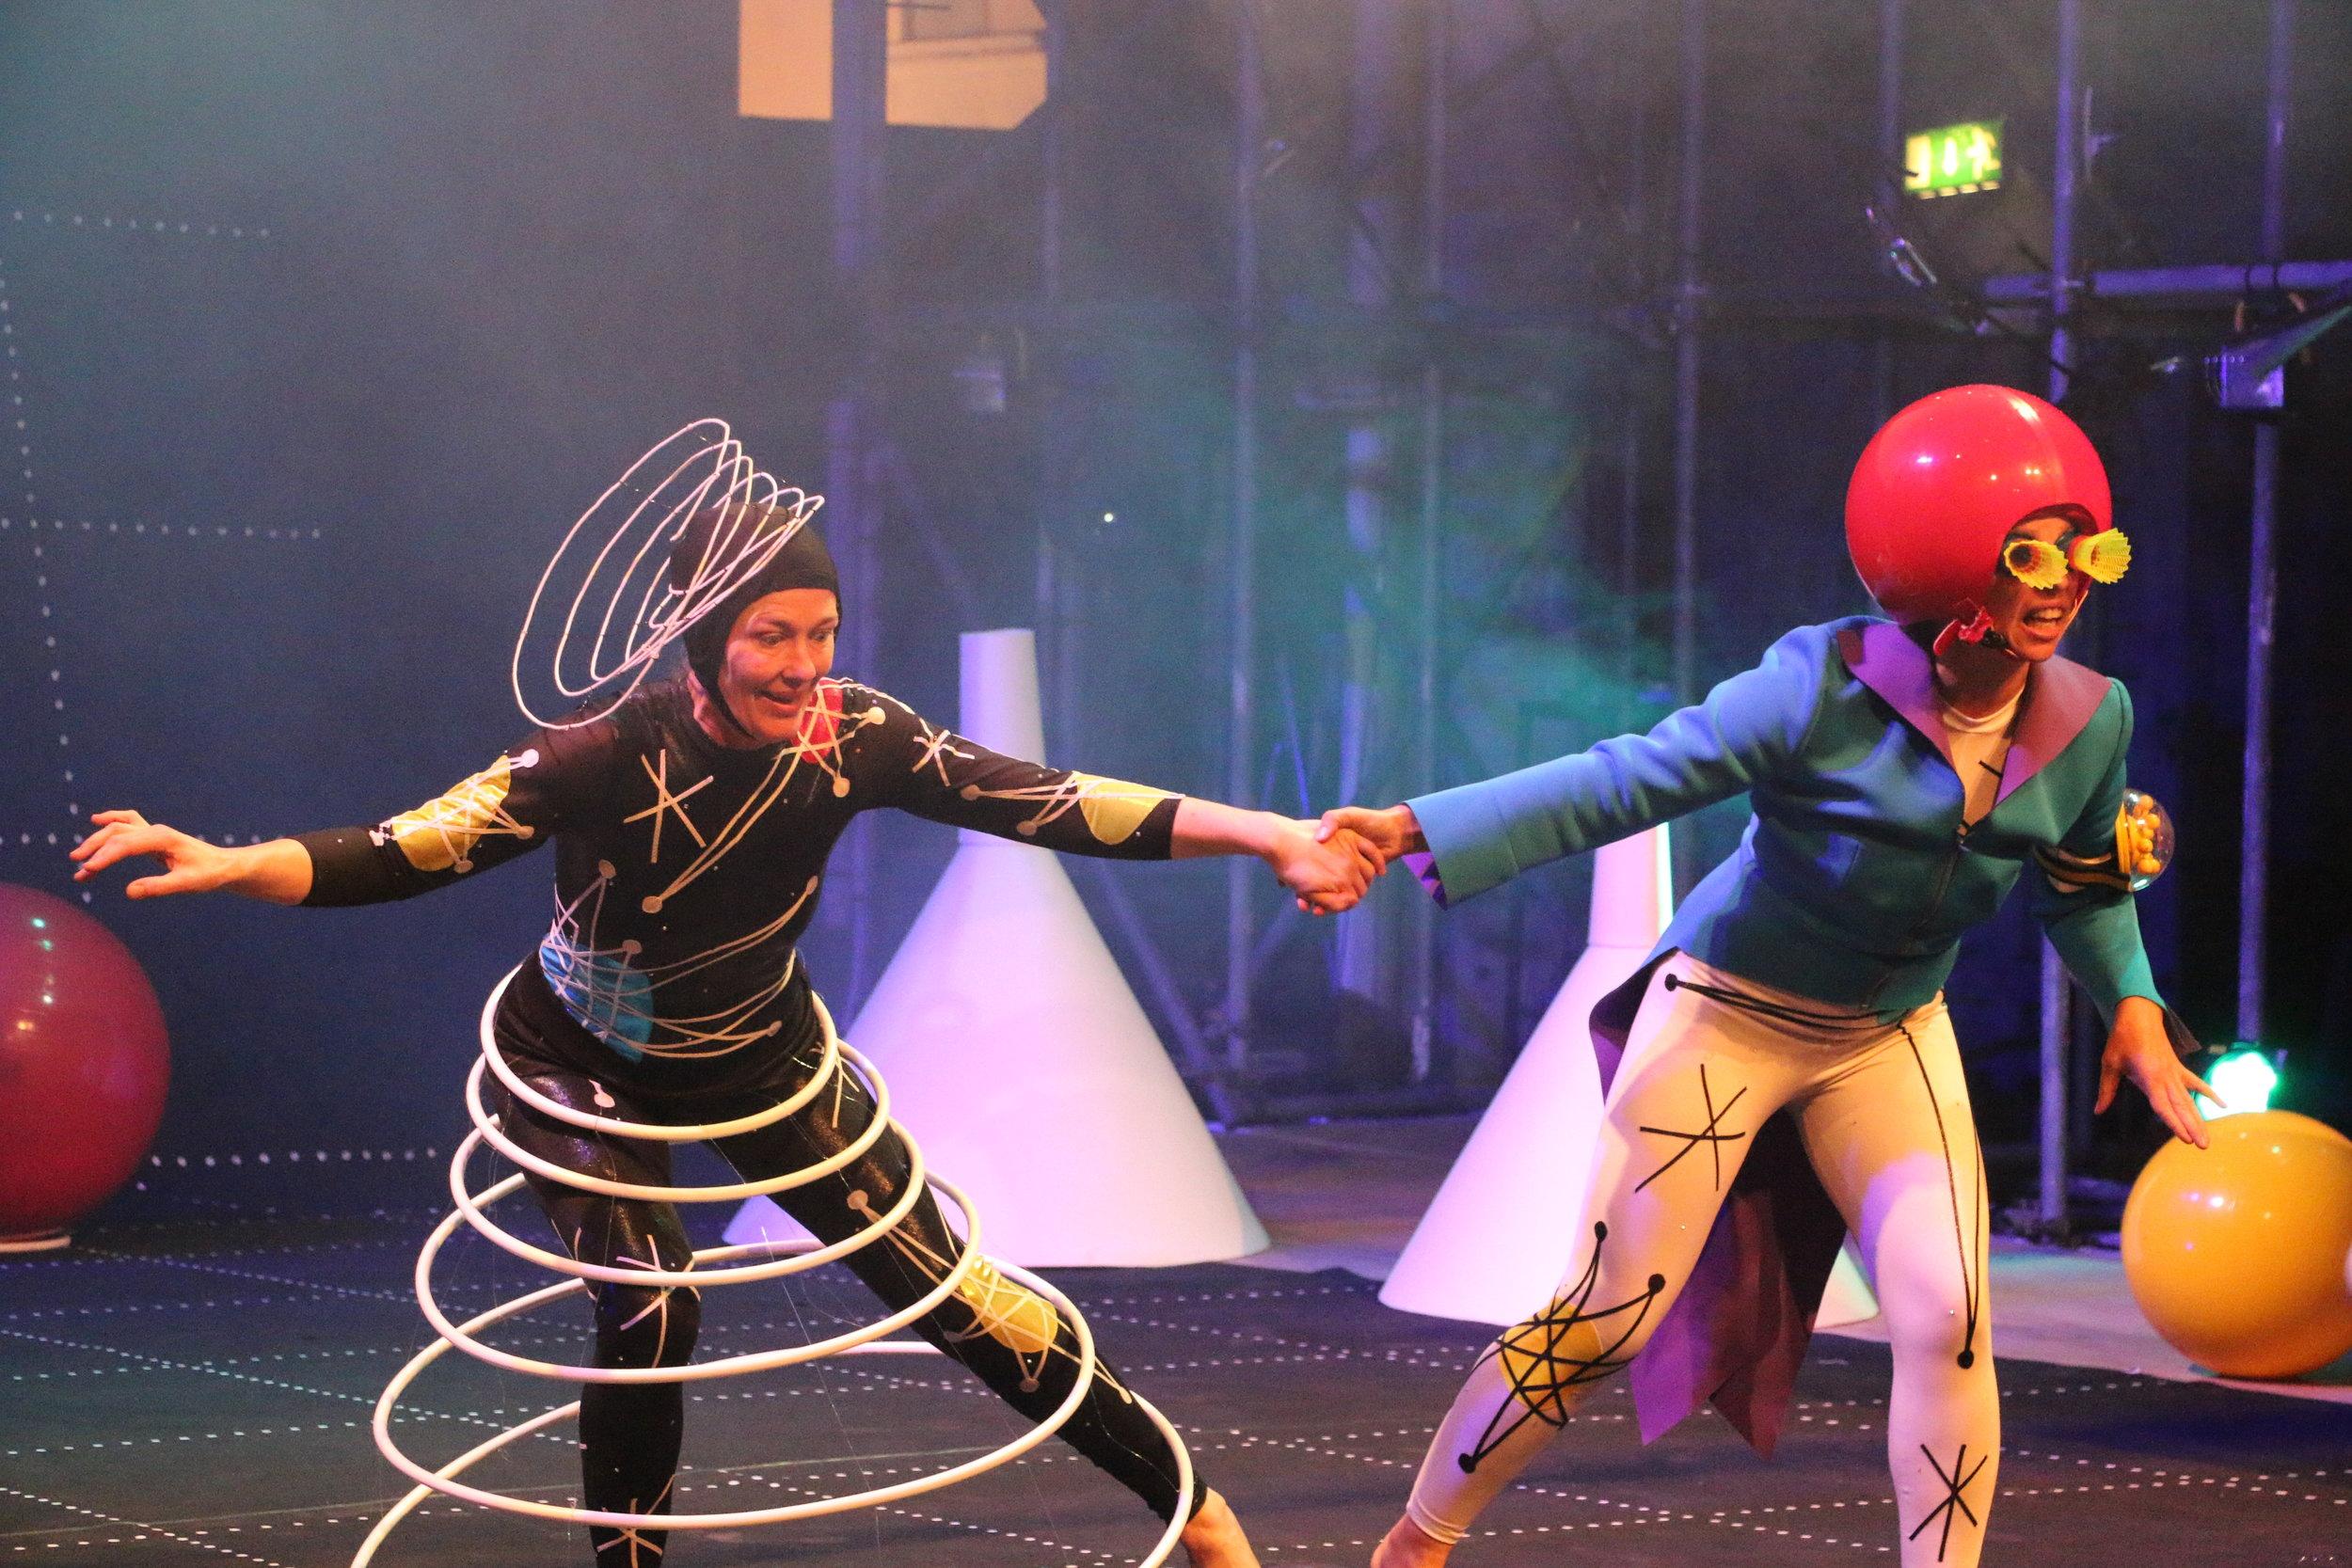 Flying Atoms performing at Edinburgh Fringe Festival 2017